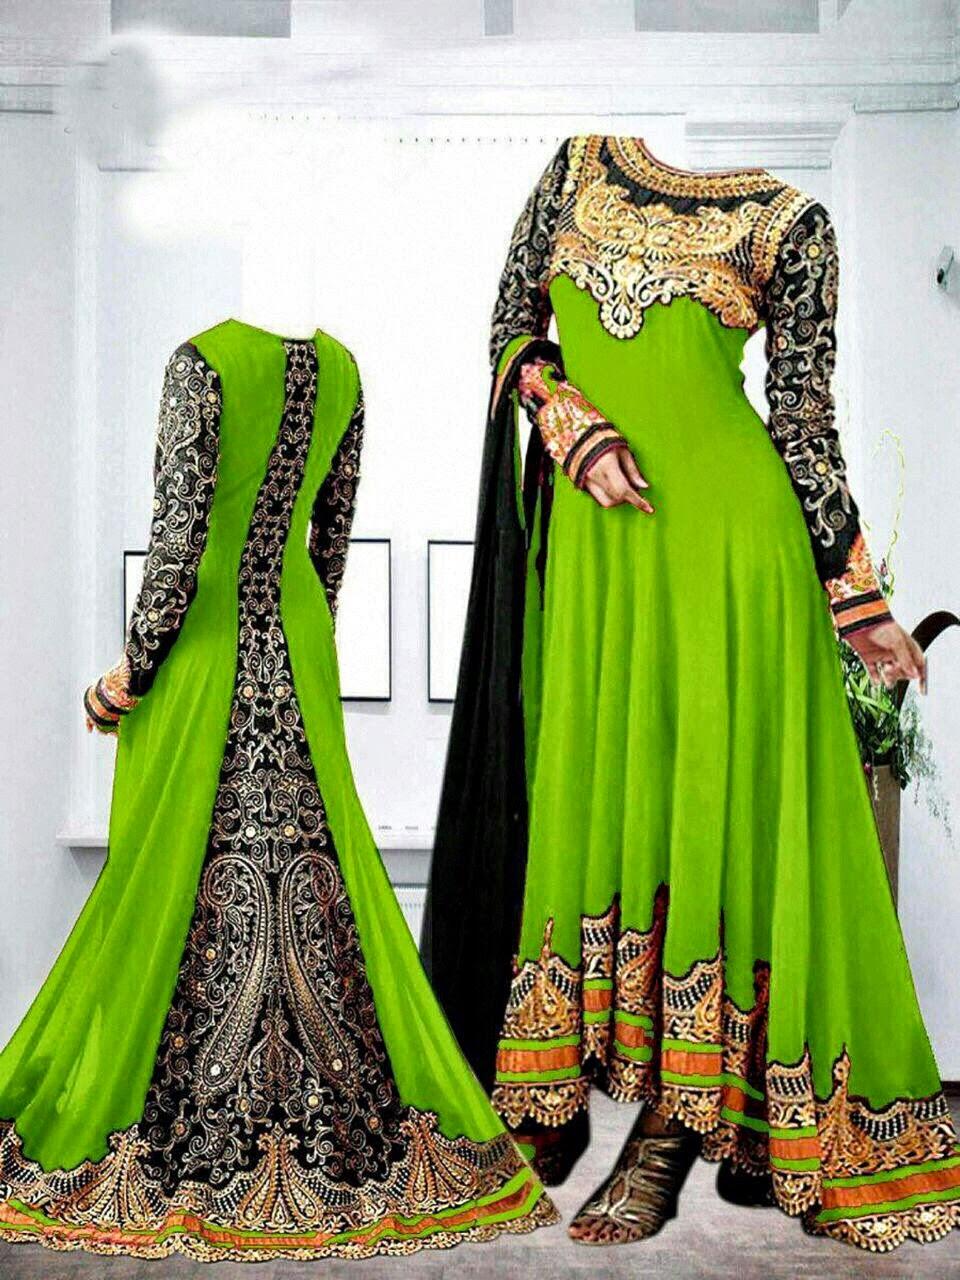 ... CRAFTSVILLA ONLINE STORE: http://www.craftsvilla.com/fashionbazaar99